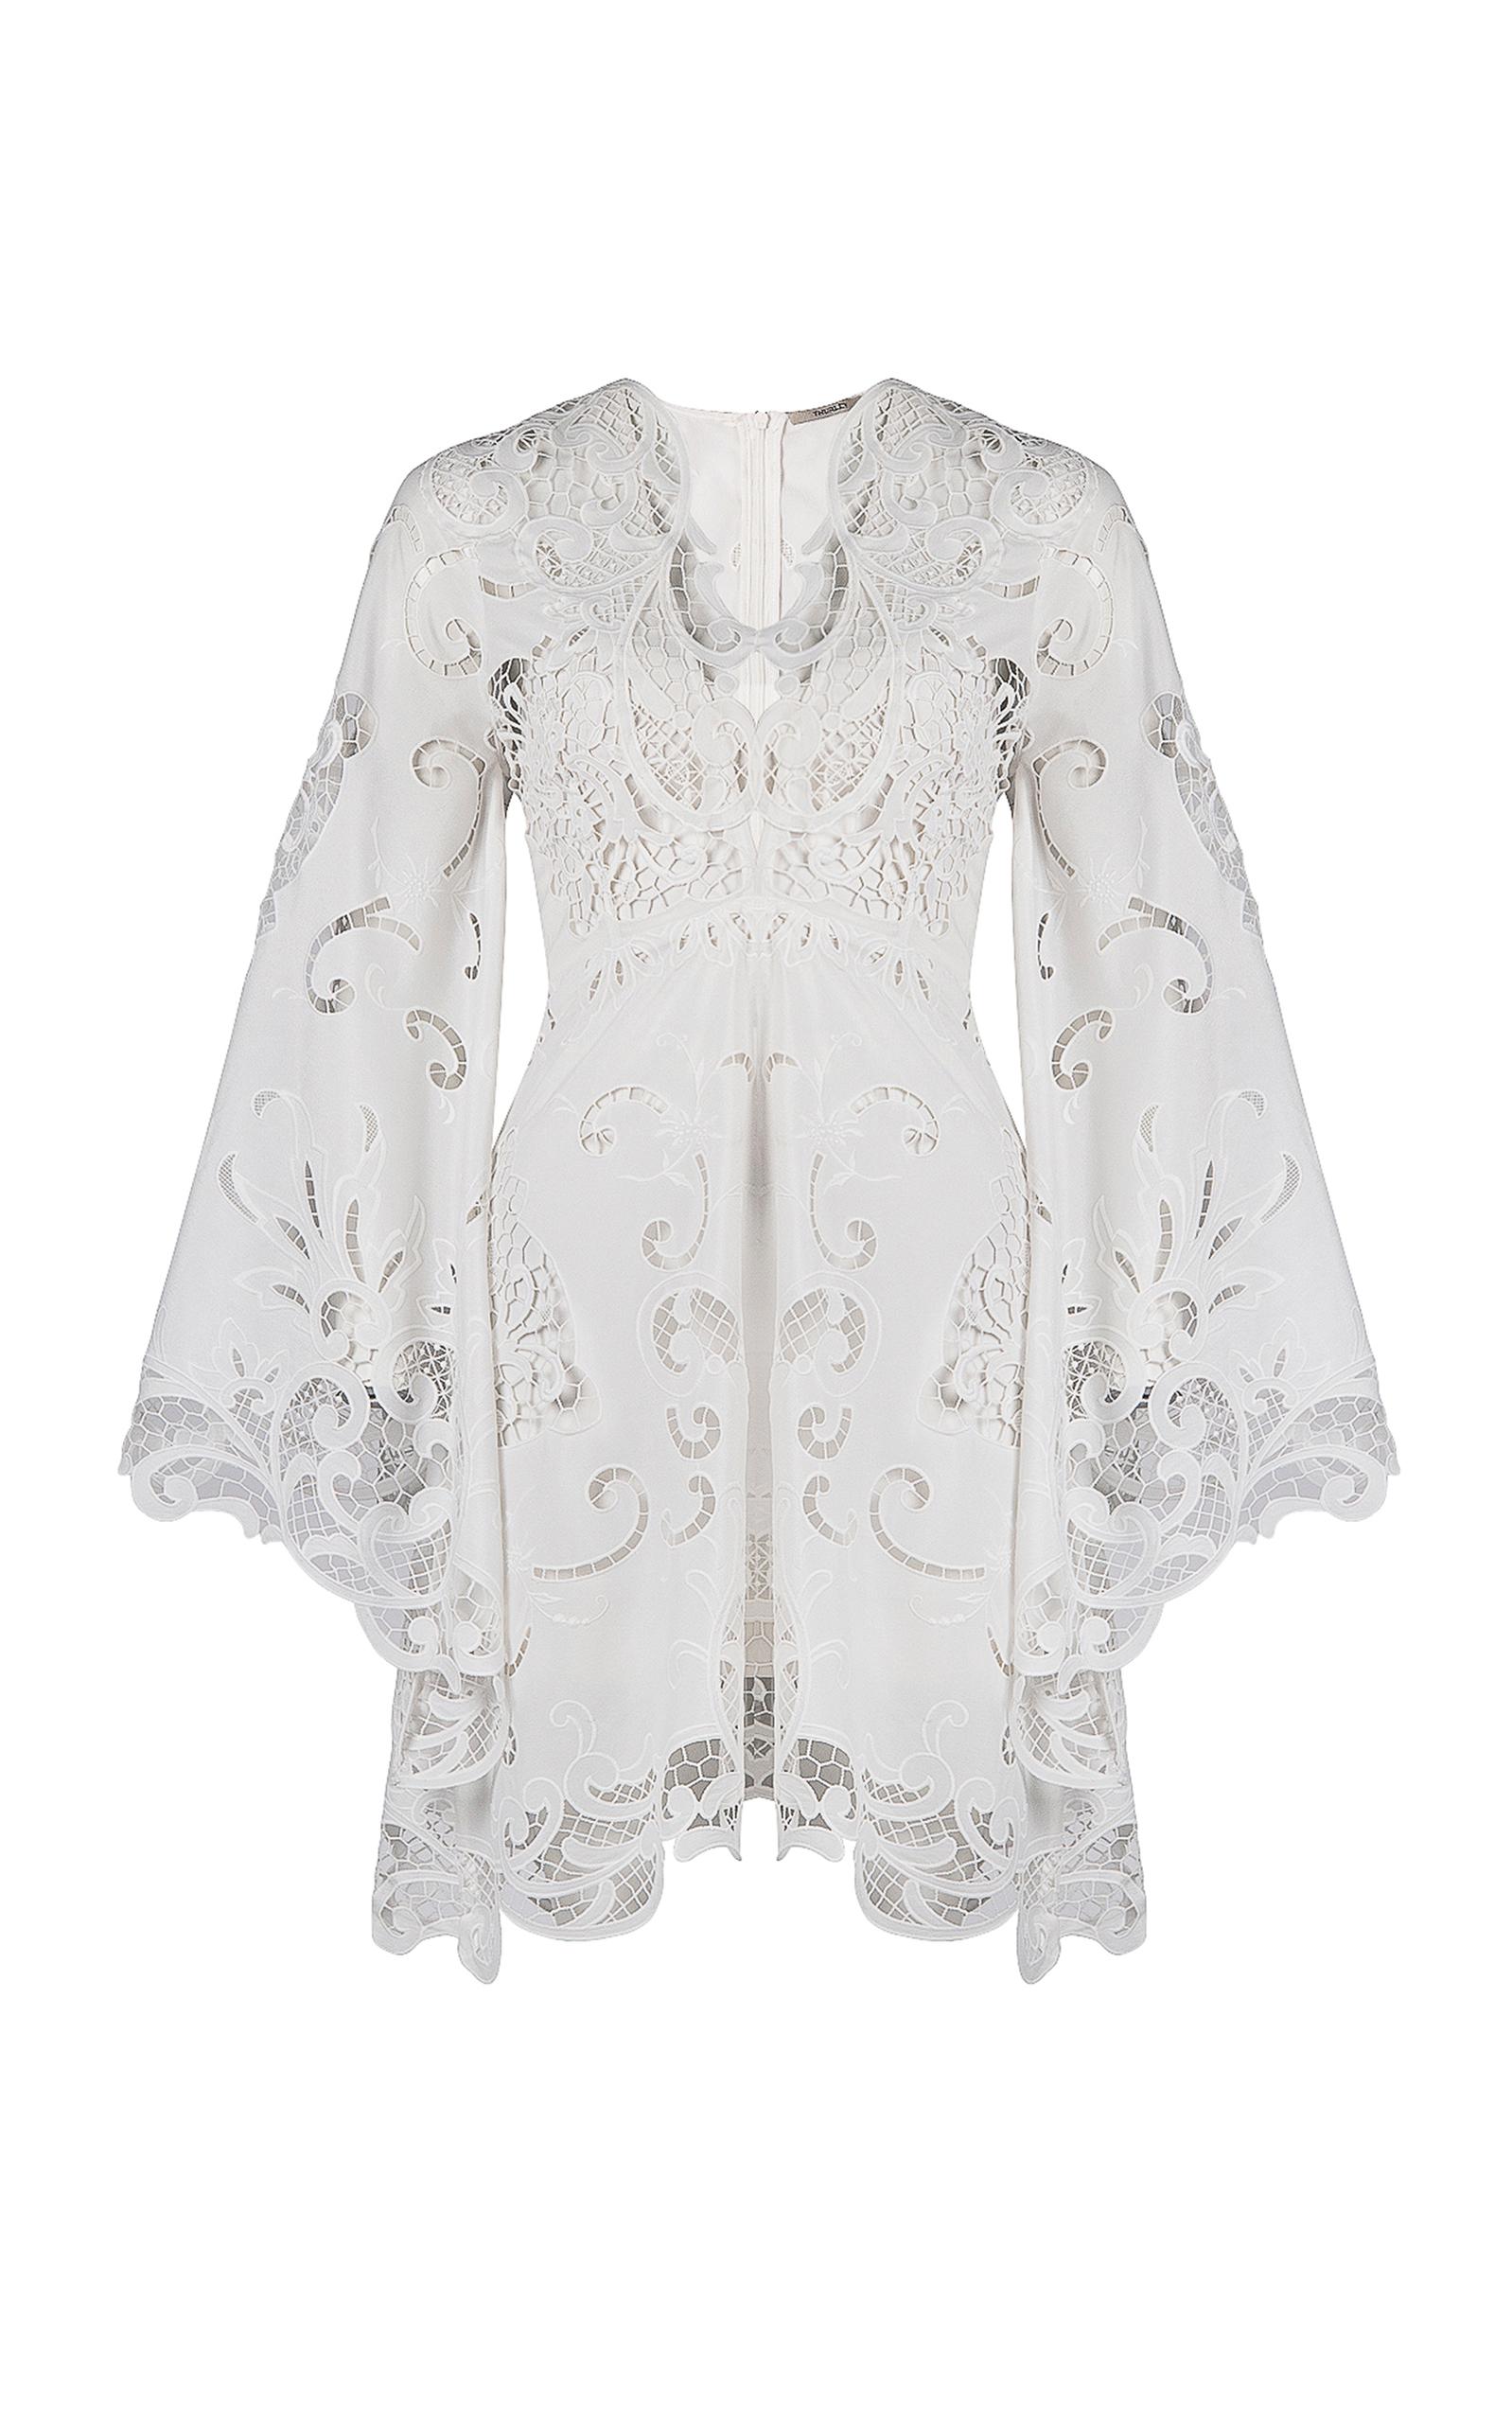 c2f1e18b7 Belle Embroidered Bell Sleeve Dress by Thurley   Moda Operandi